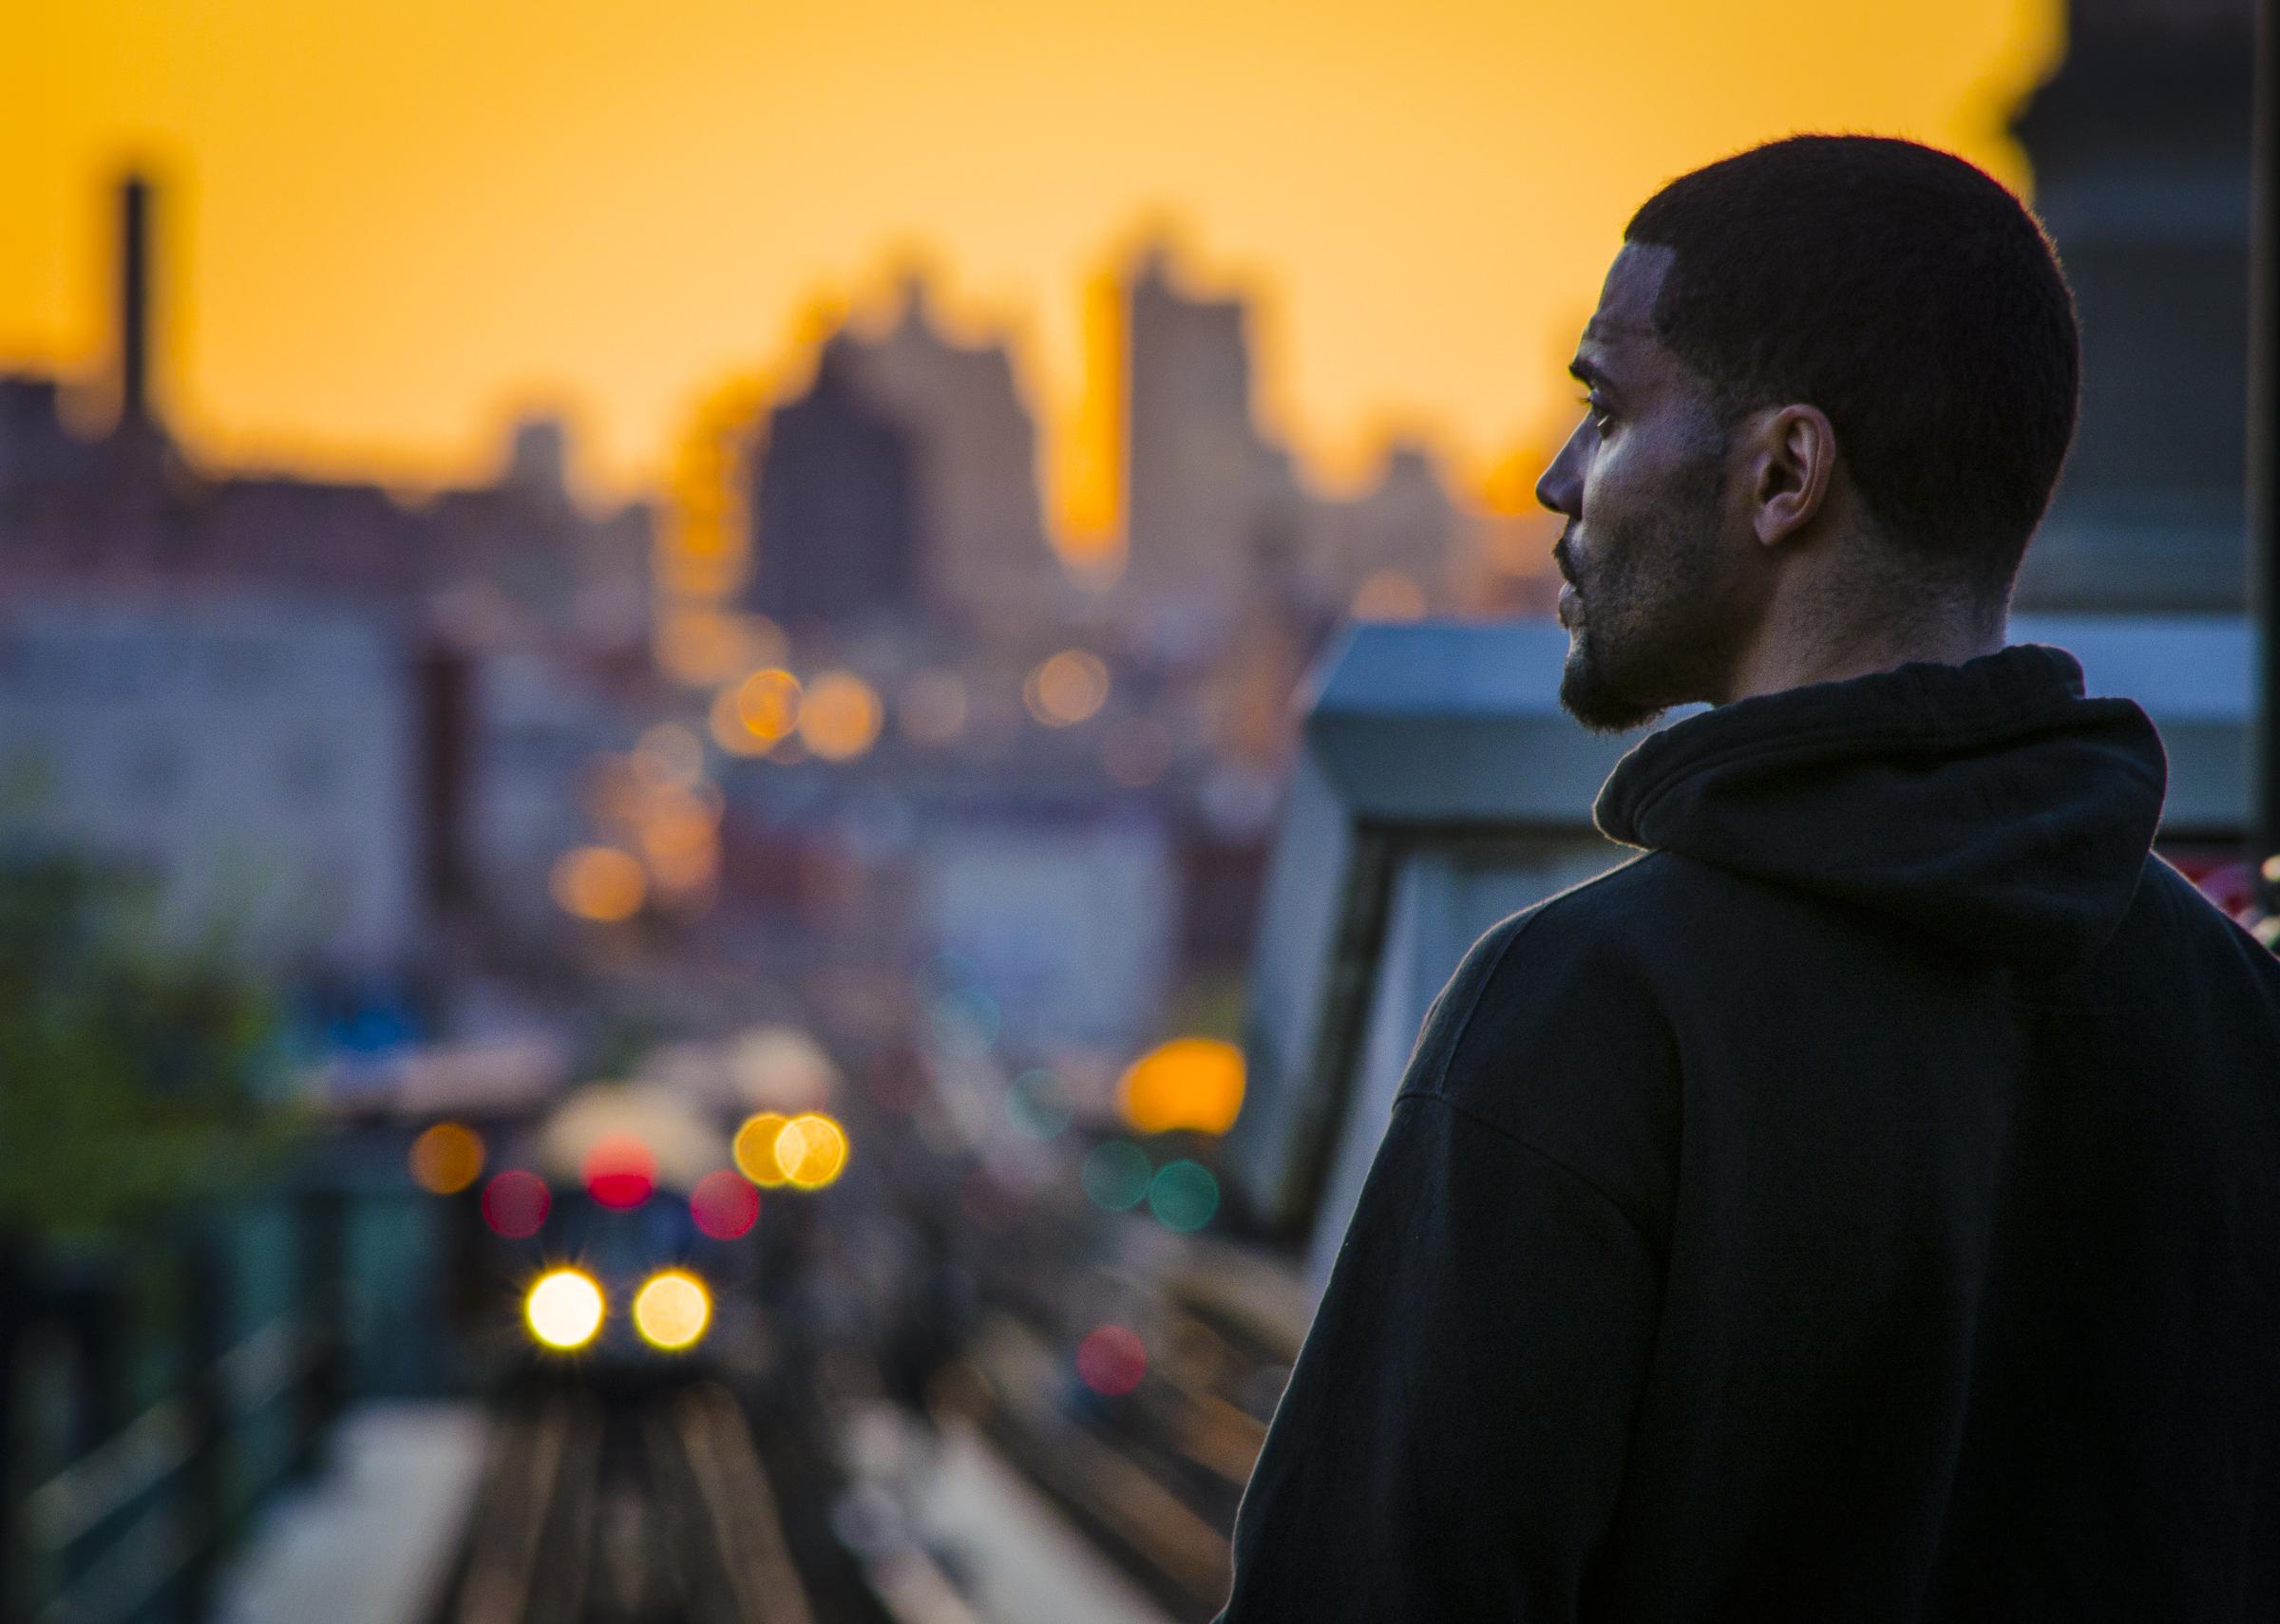 Subway ride. New York, NY 2014 © Merelyn Bucio NYC SALT